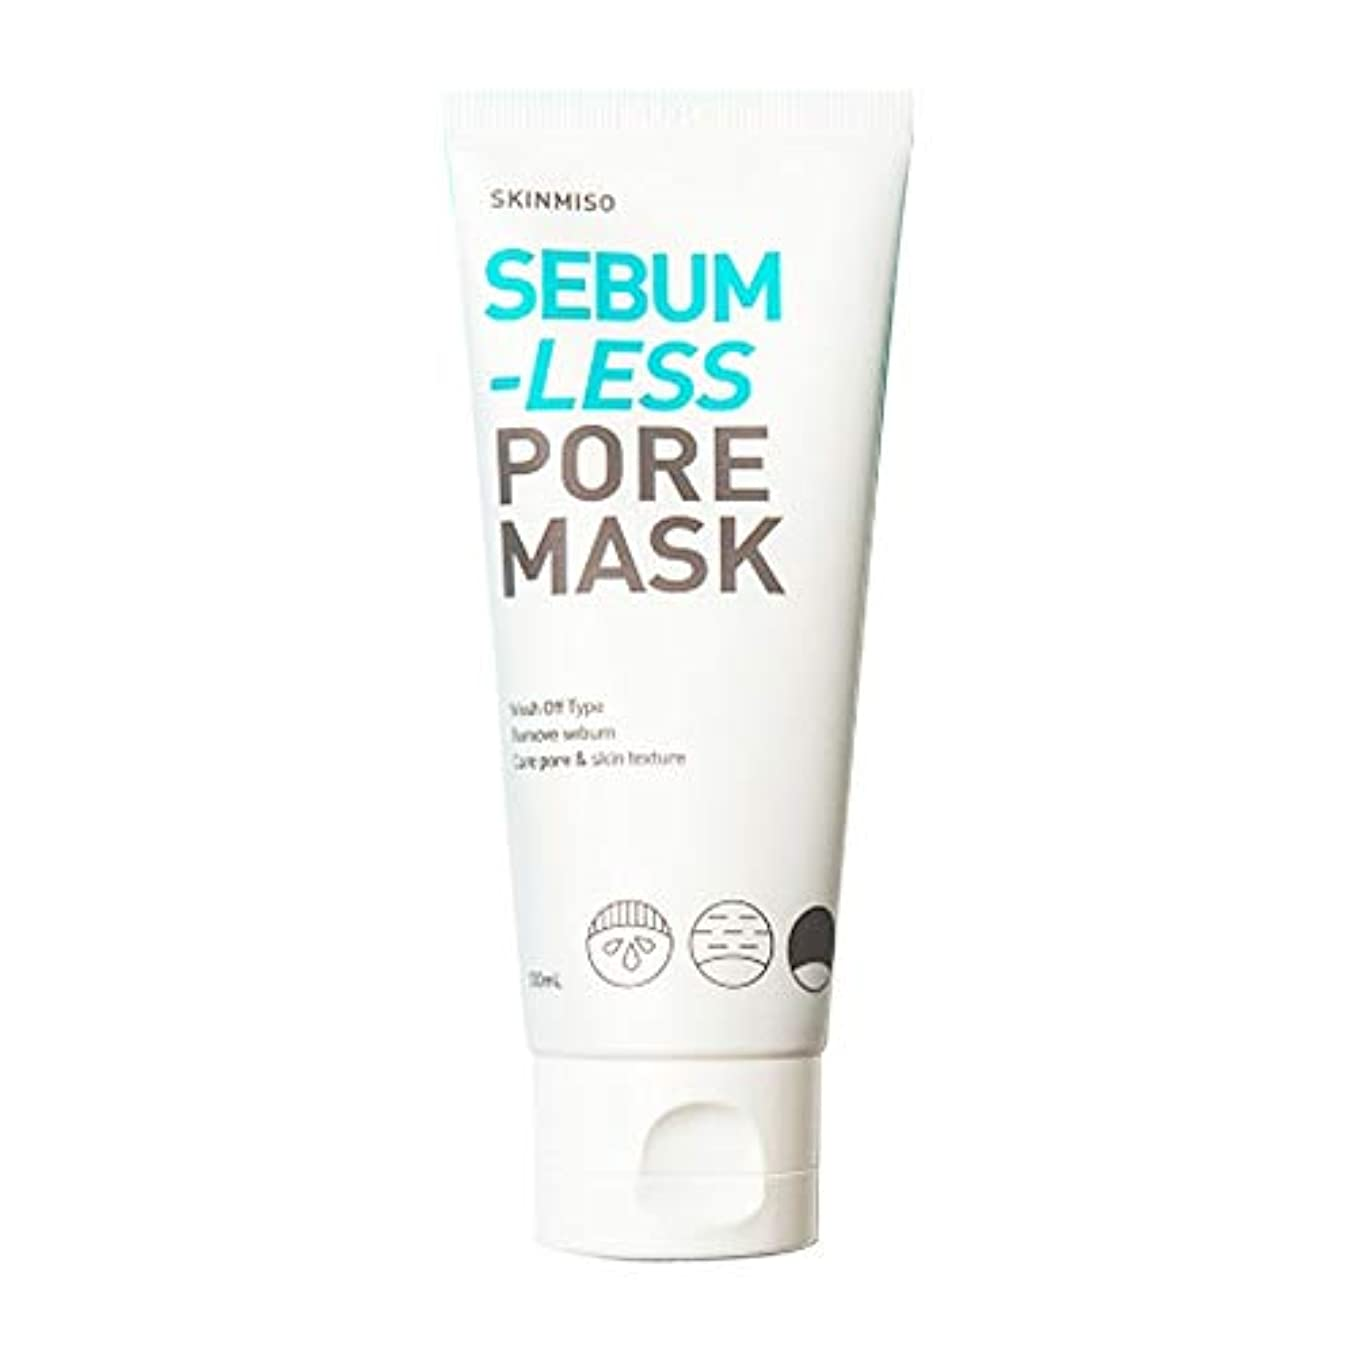 [SKINMISO/スキンミソ] Sebumless Pore Mask/シーバムレスポアーマスク Skingarden/スキンガーデン